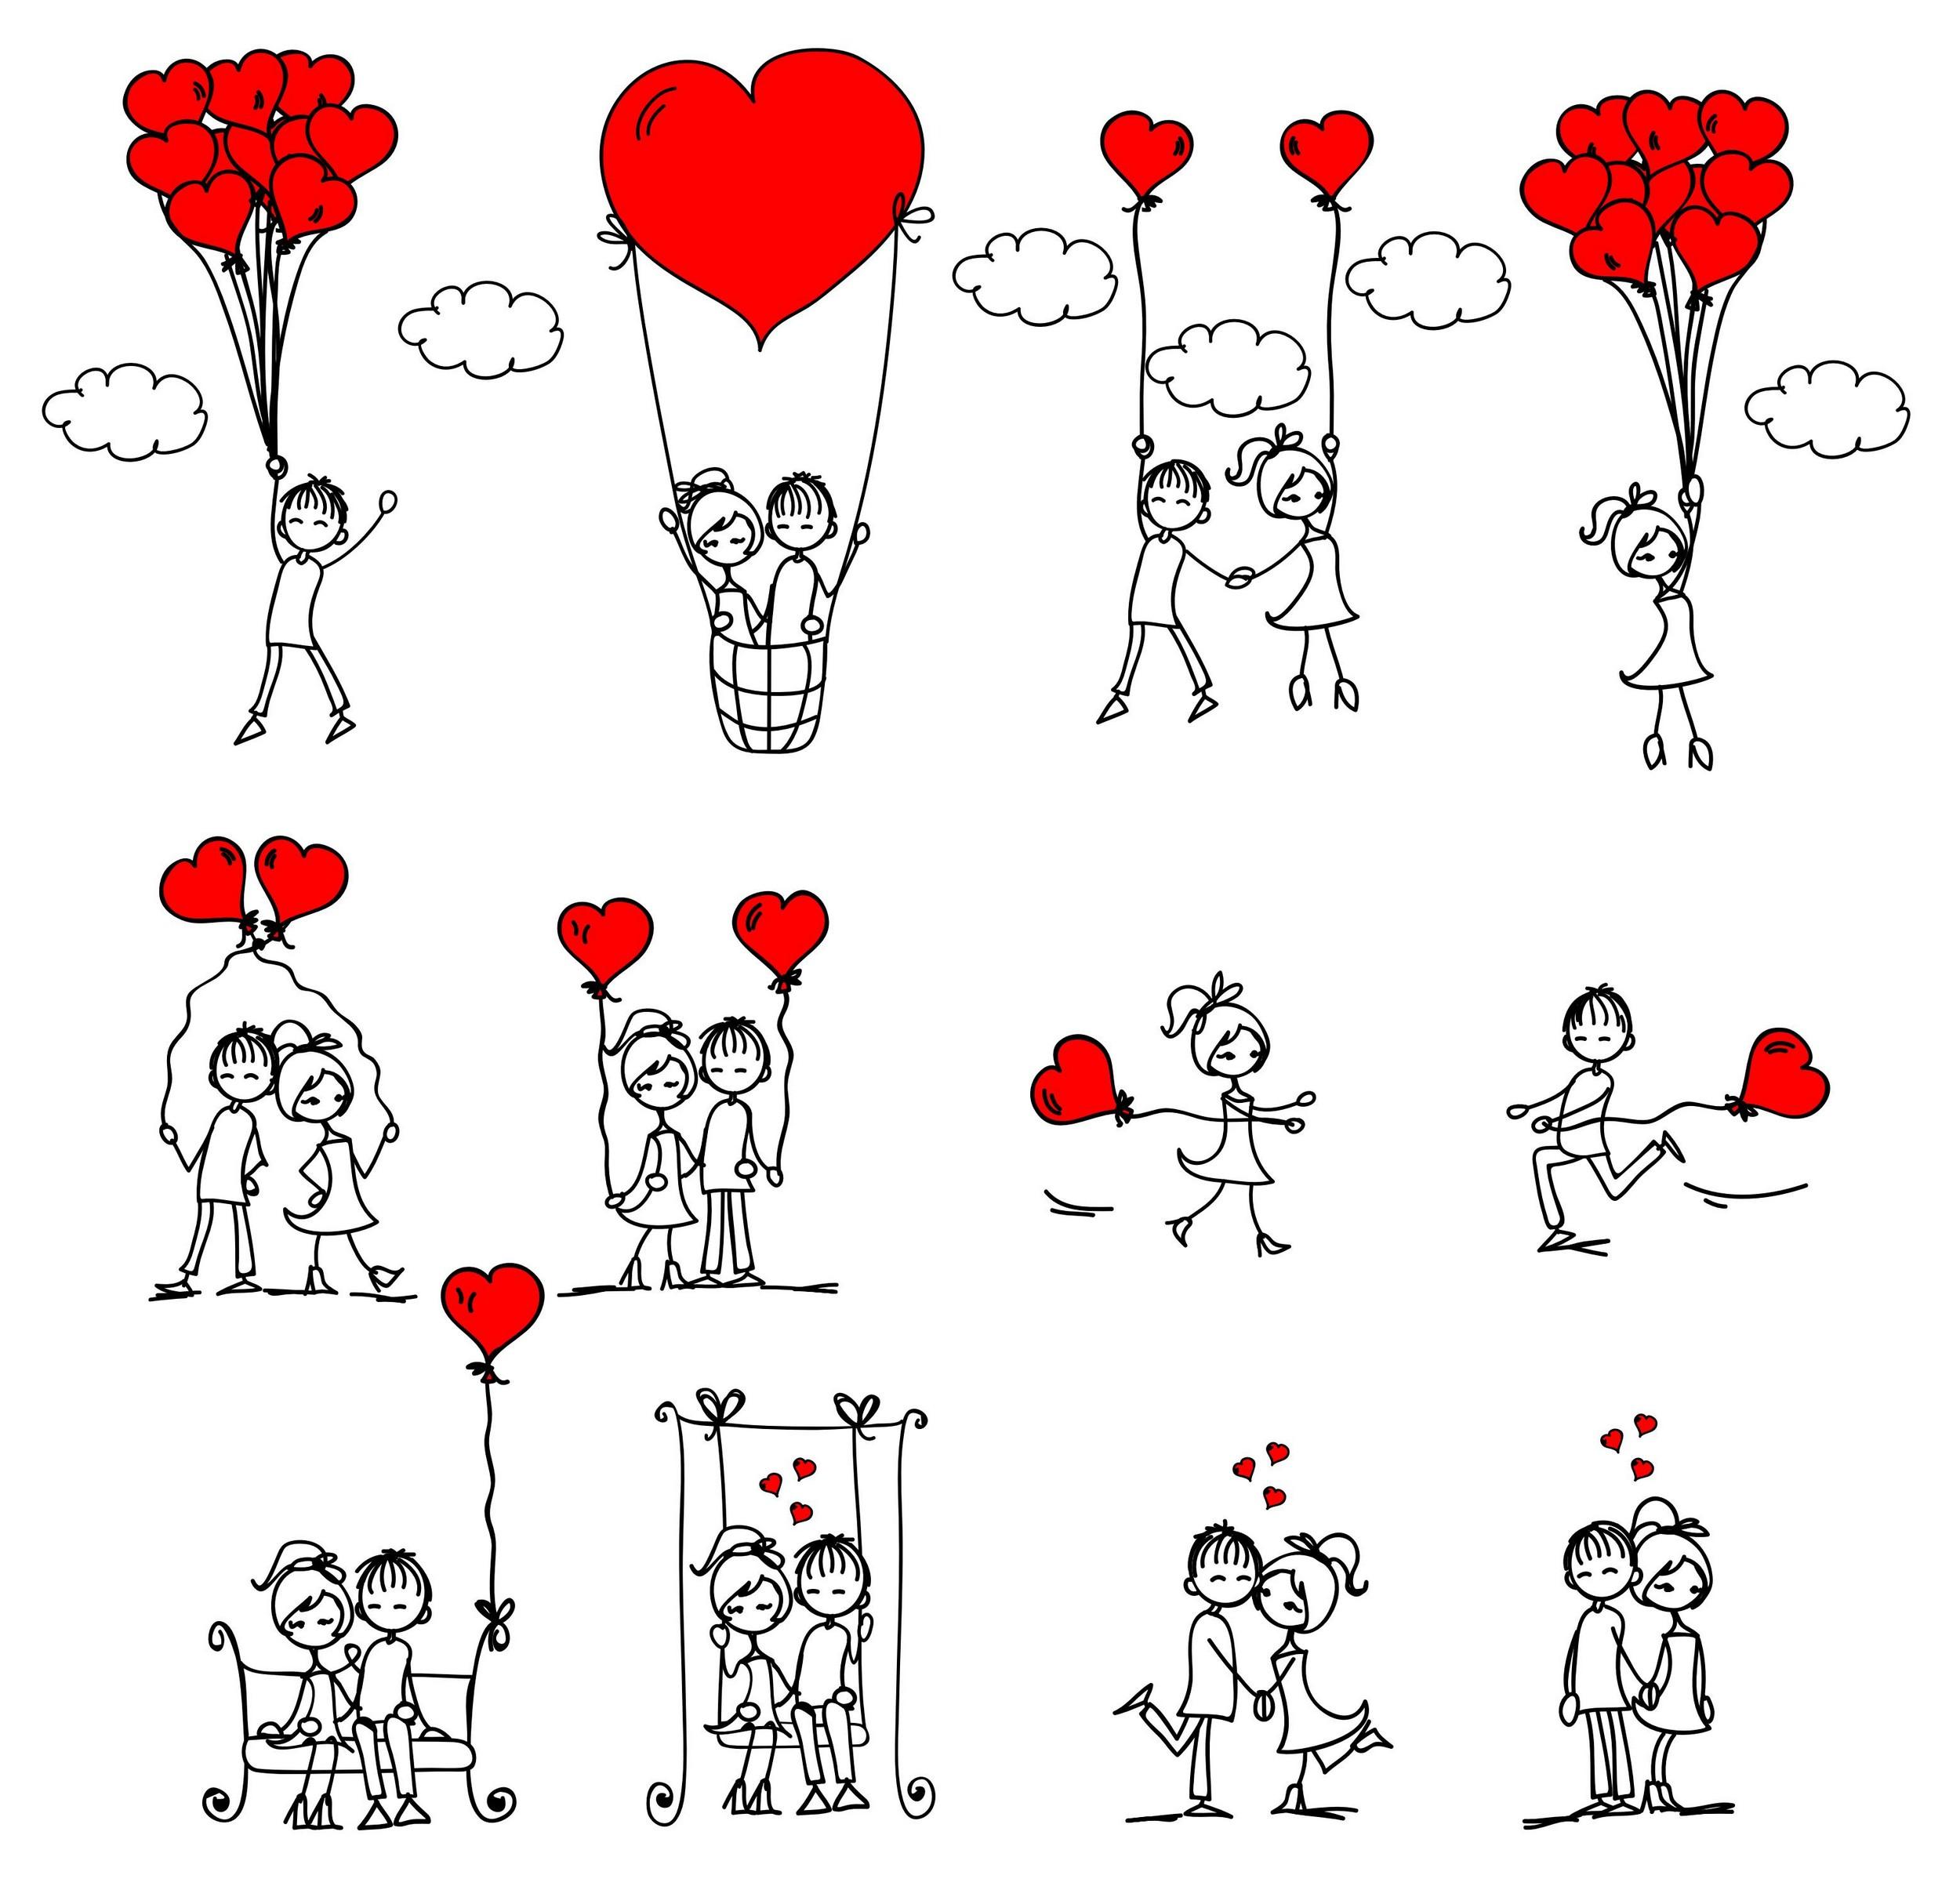 Frases de amor clipart vector free stock Frases De Amor Cn Musica - J Kosong v vector free stock